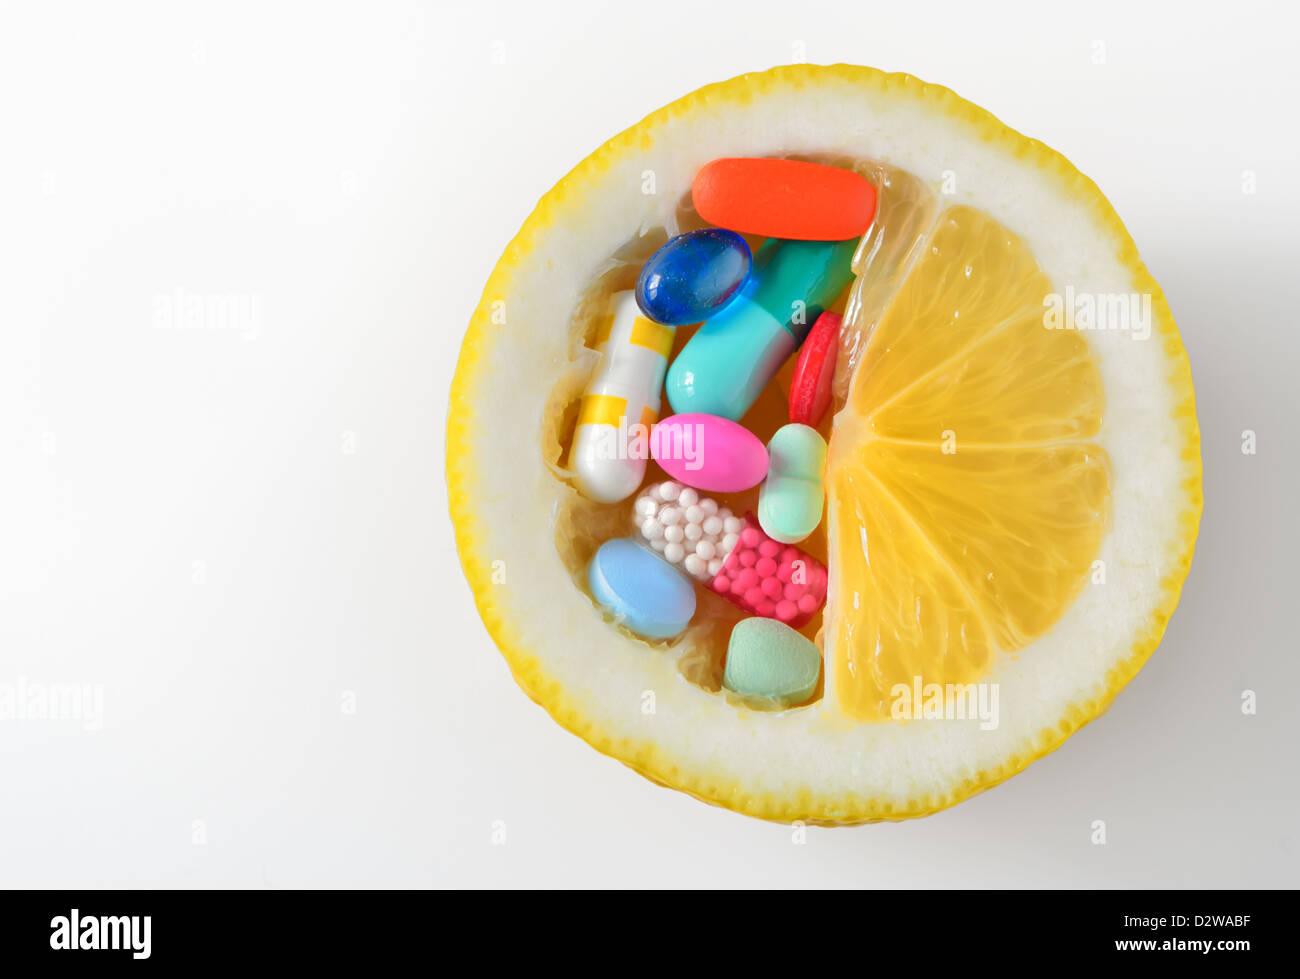 vitamin c pills - Stock Image